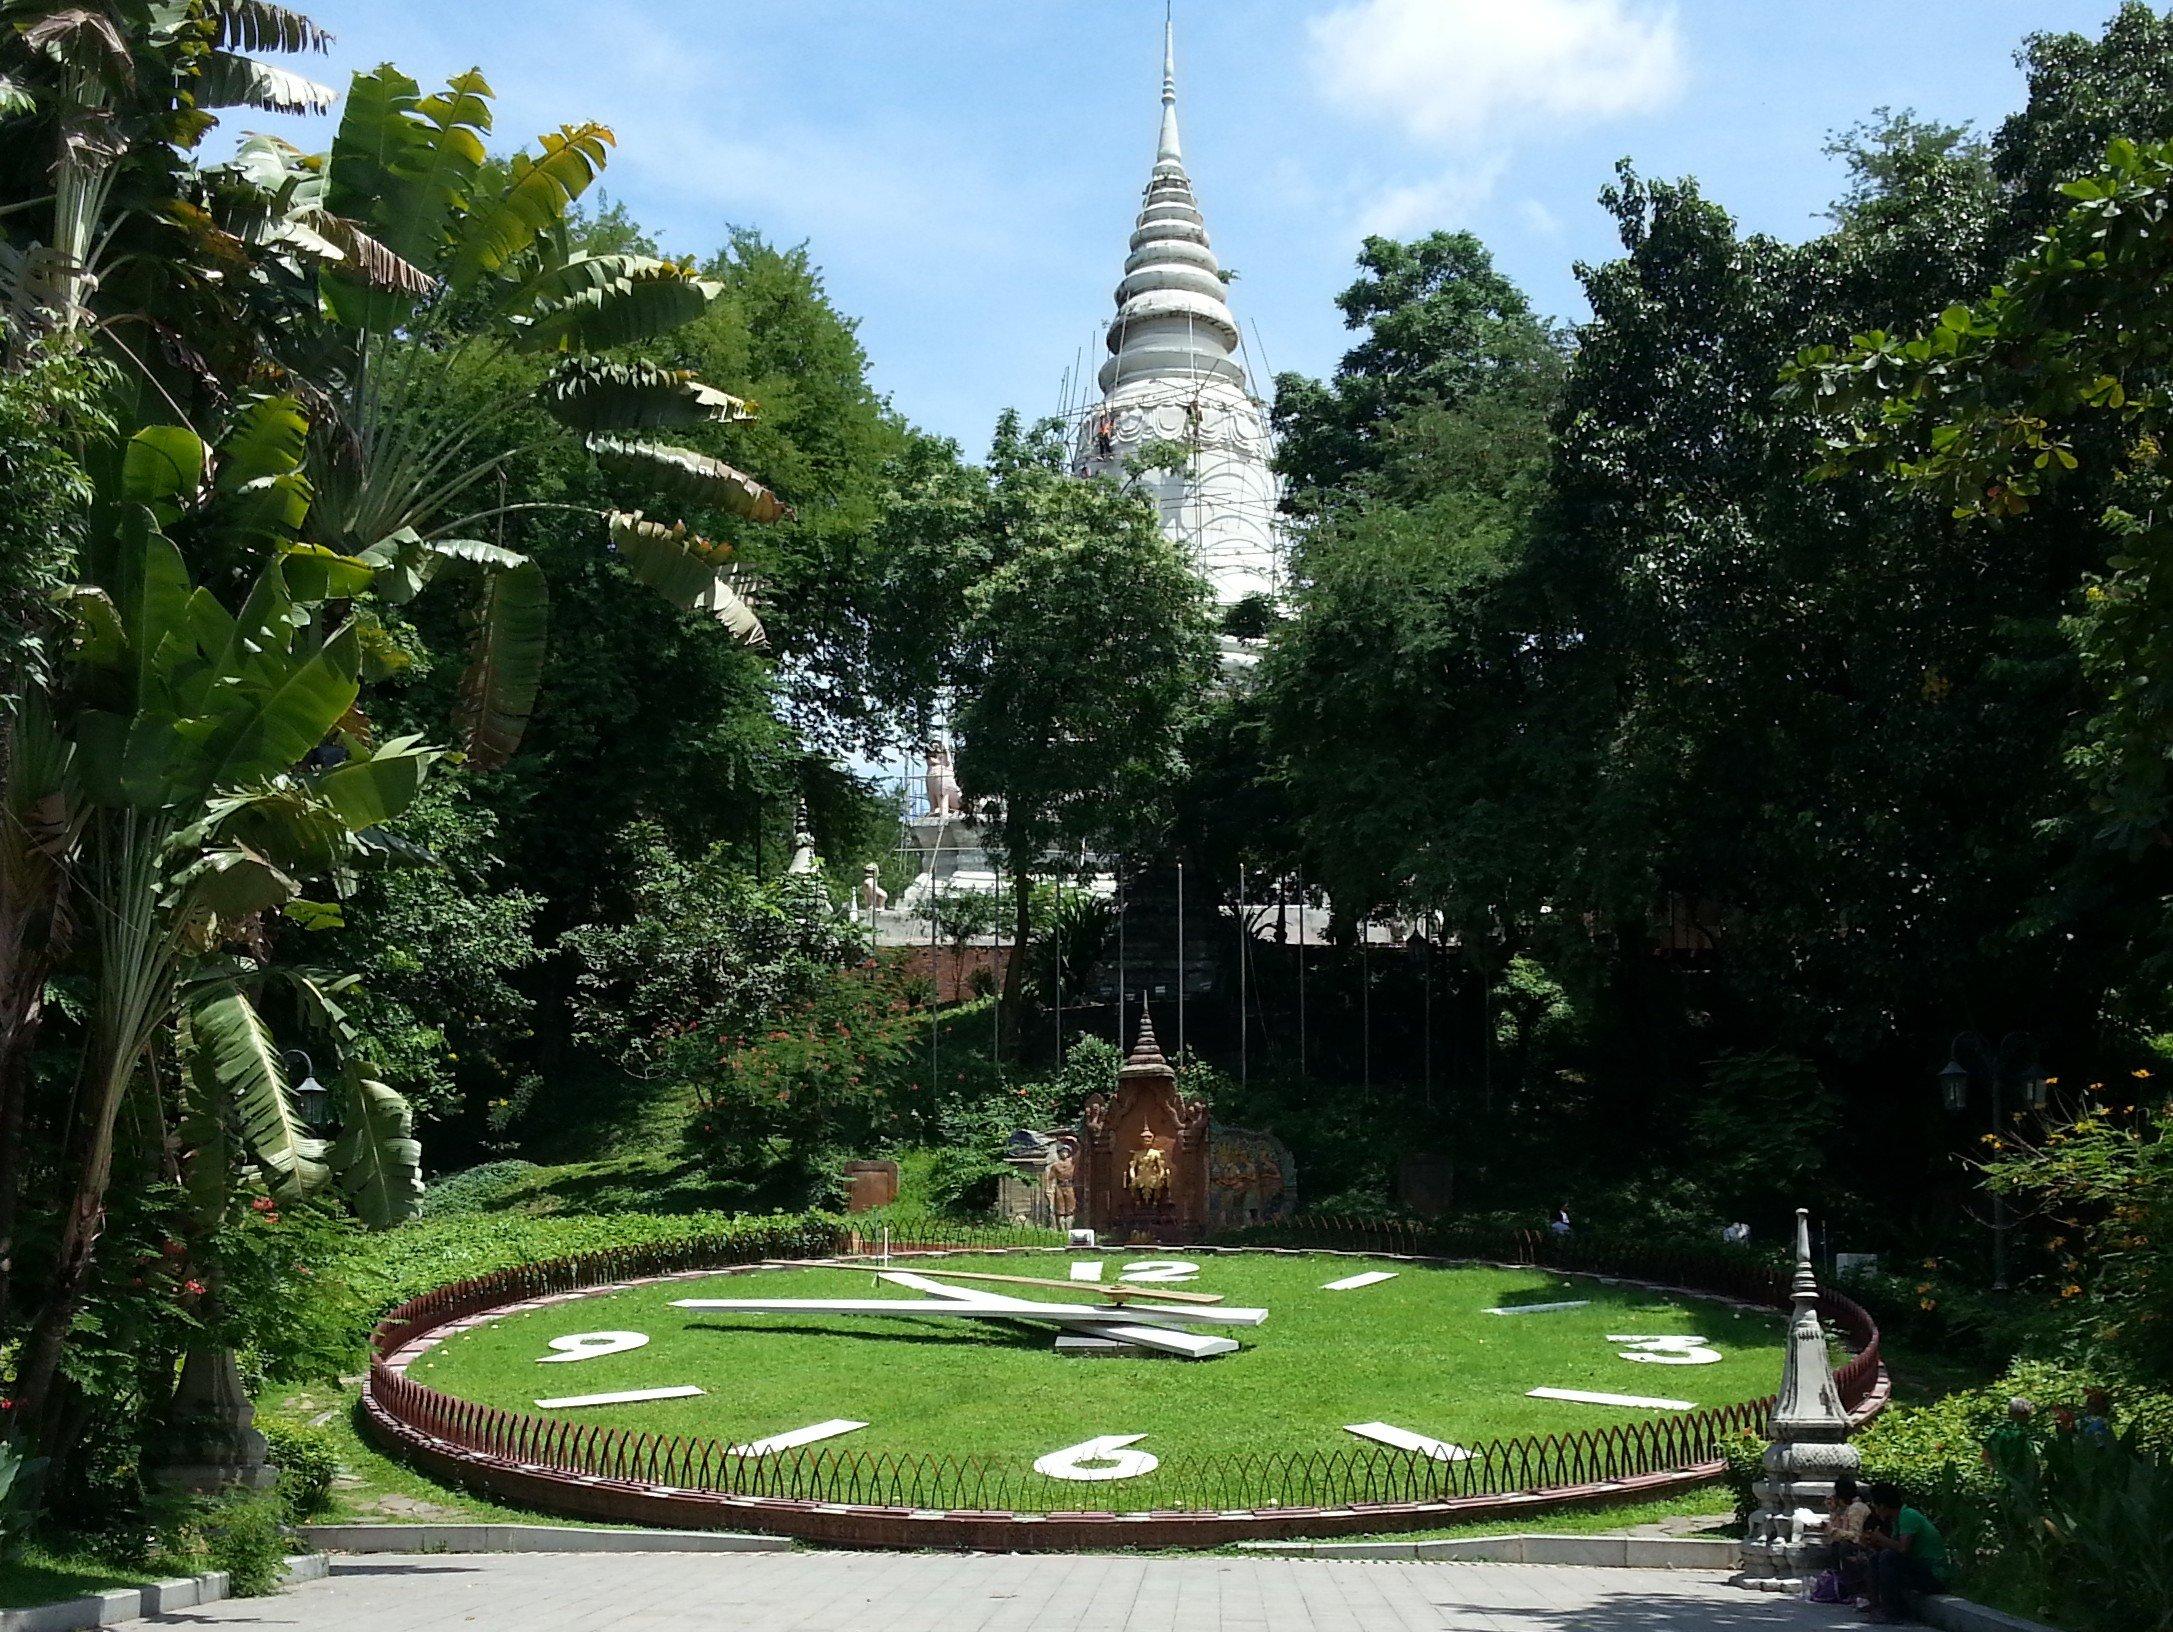 Giant clock at Wat Phnom